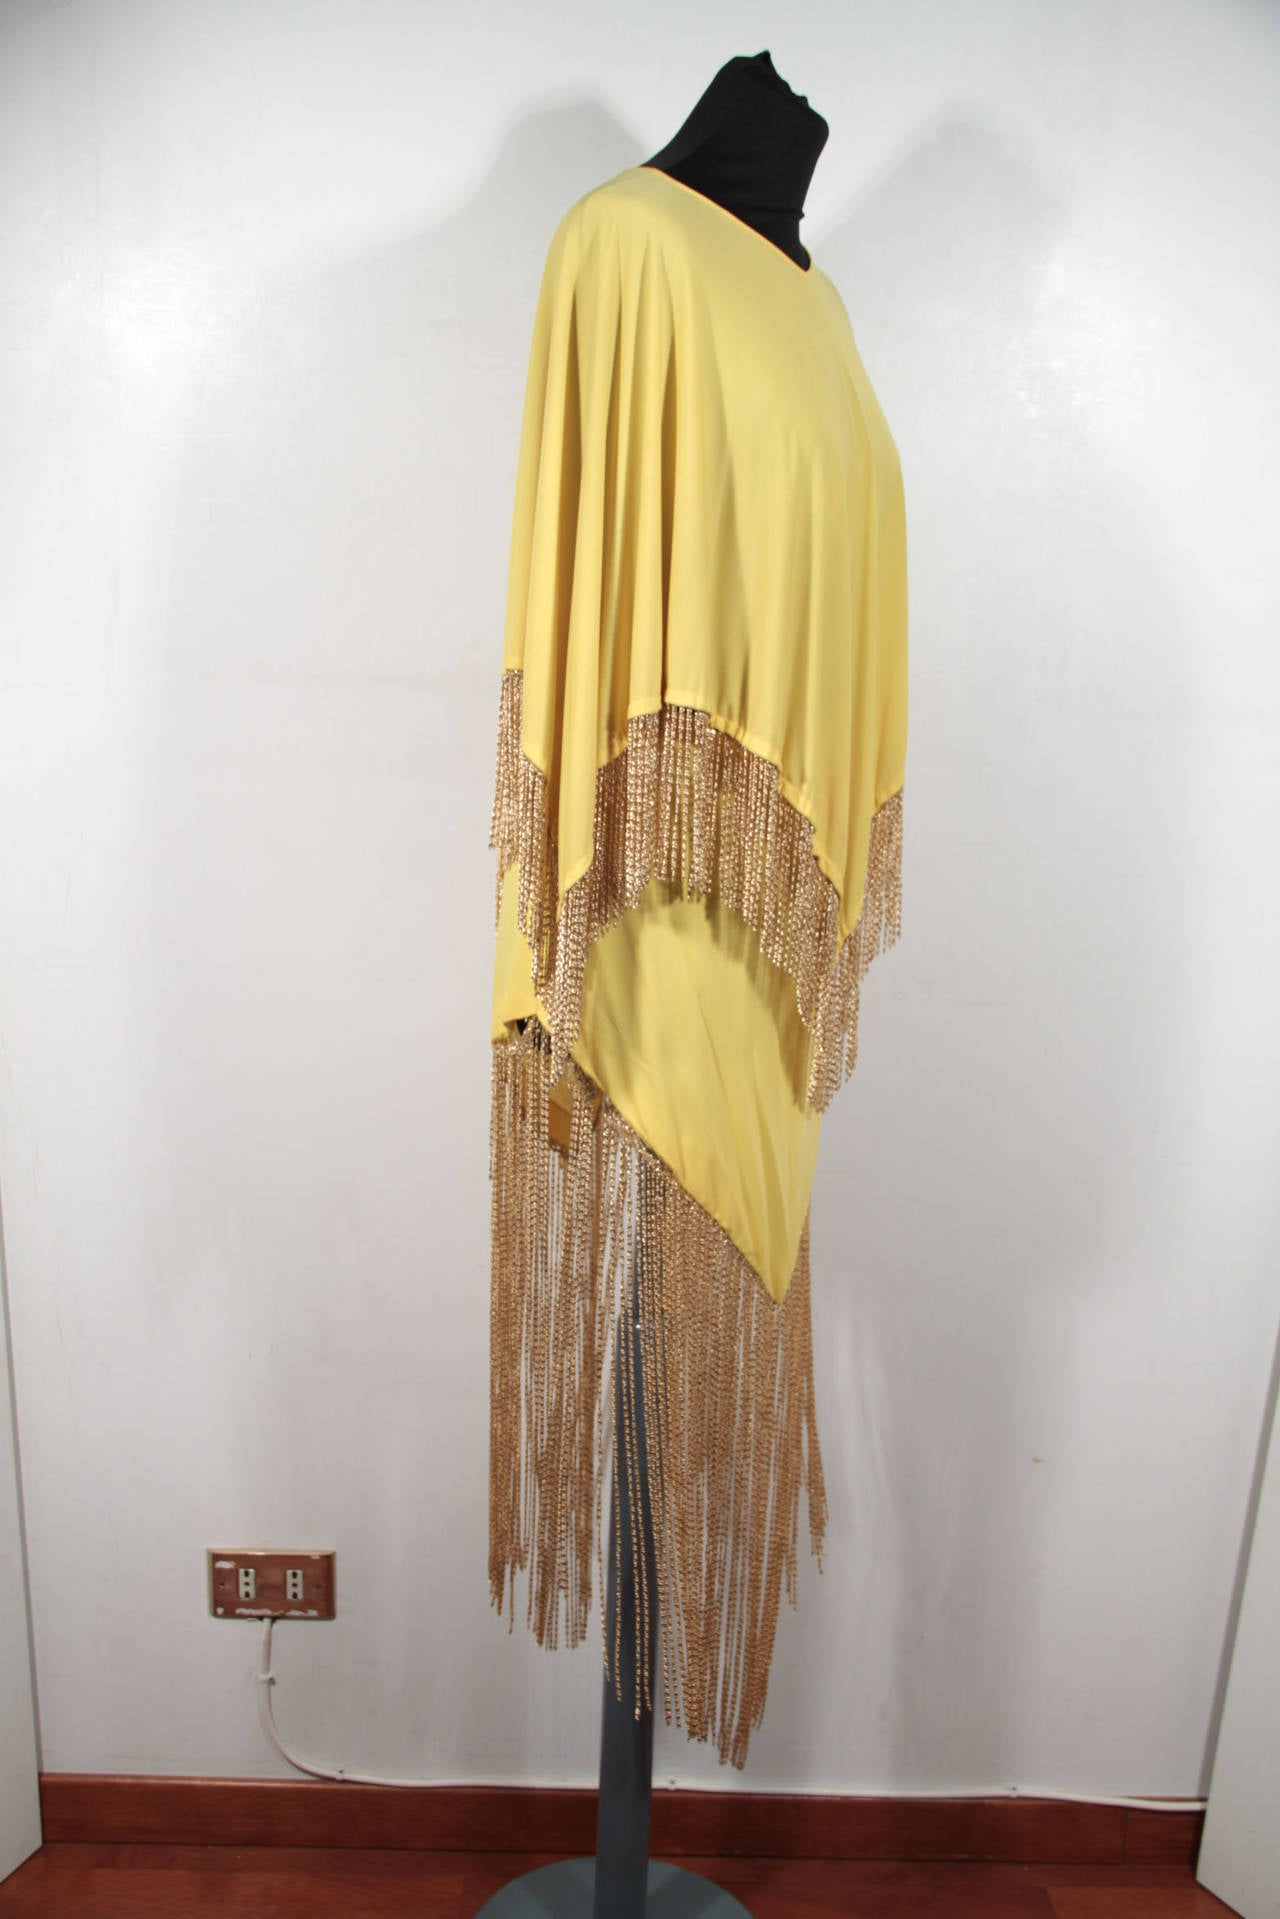 LORIS AZZARO Vintage 70s Yellow CAPE TOP & SKIRT SET Dress Long CHAIN FRINGES 3